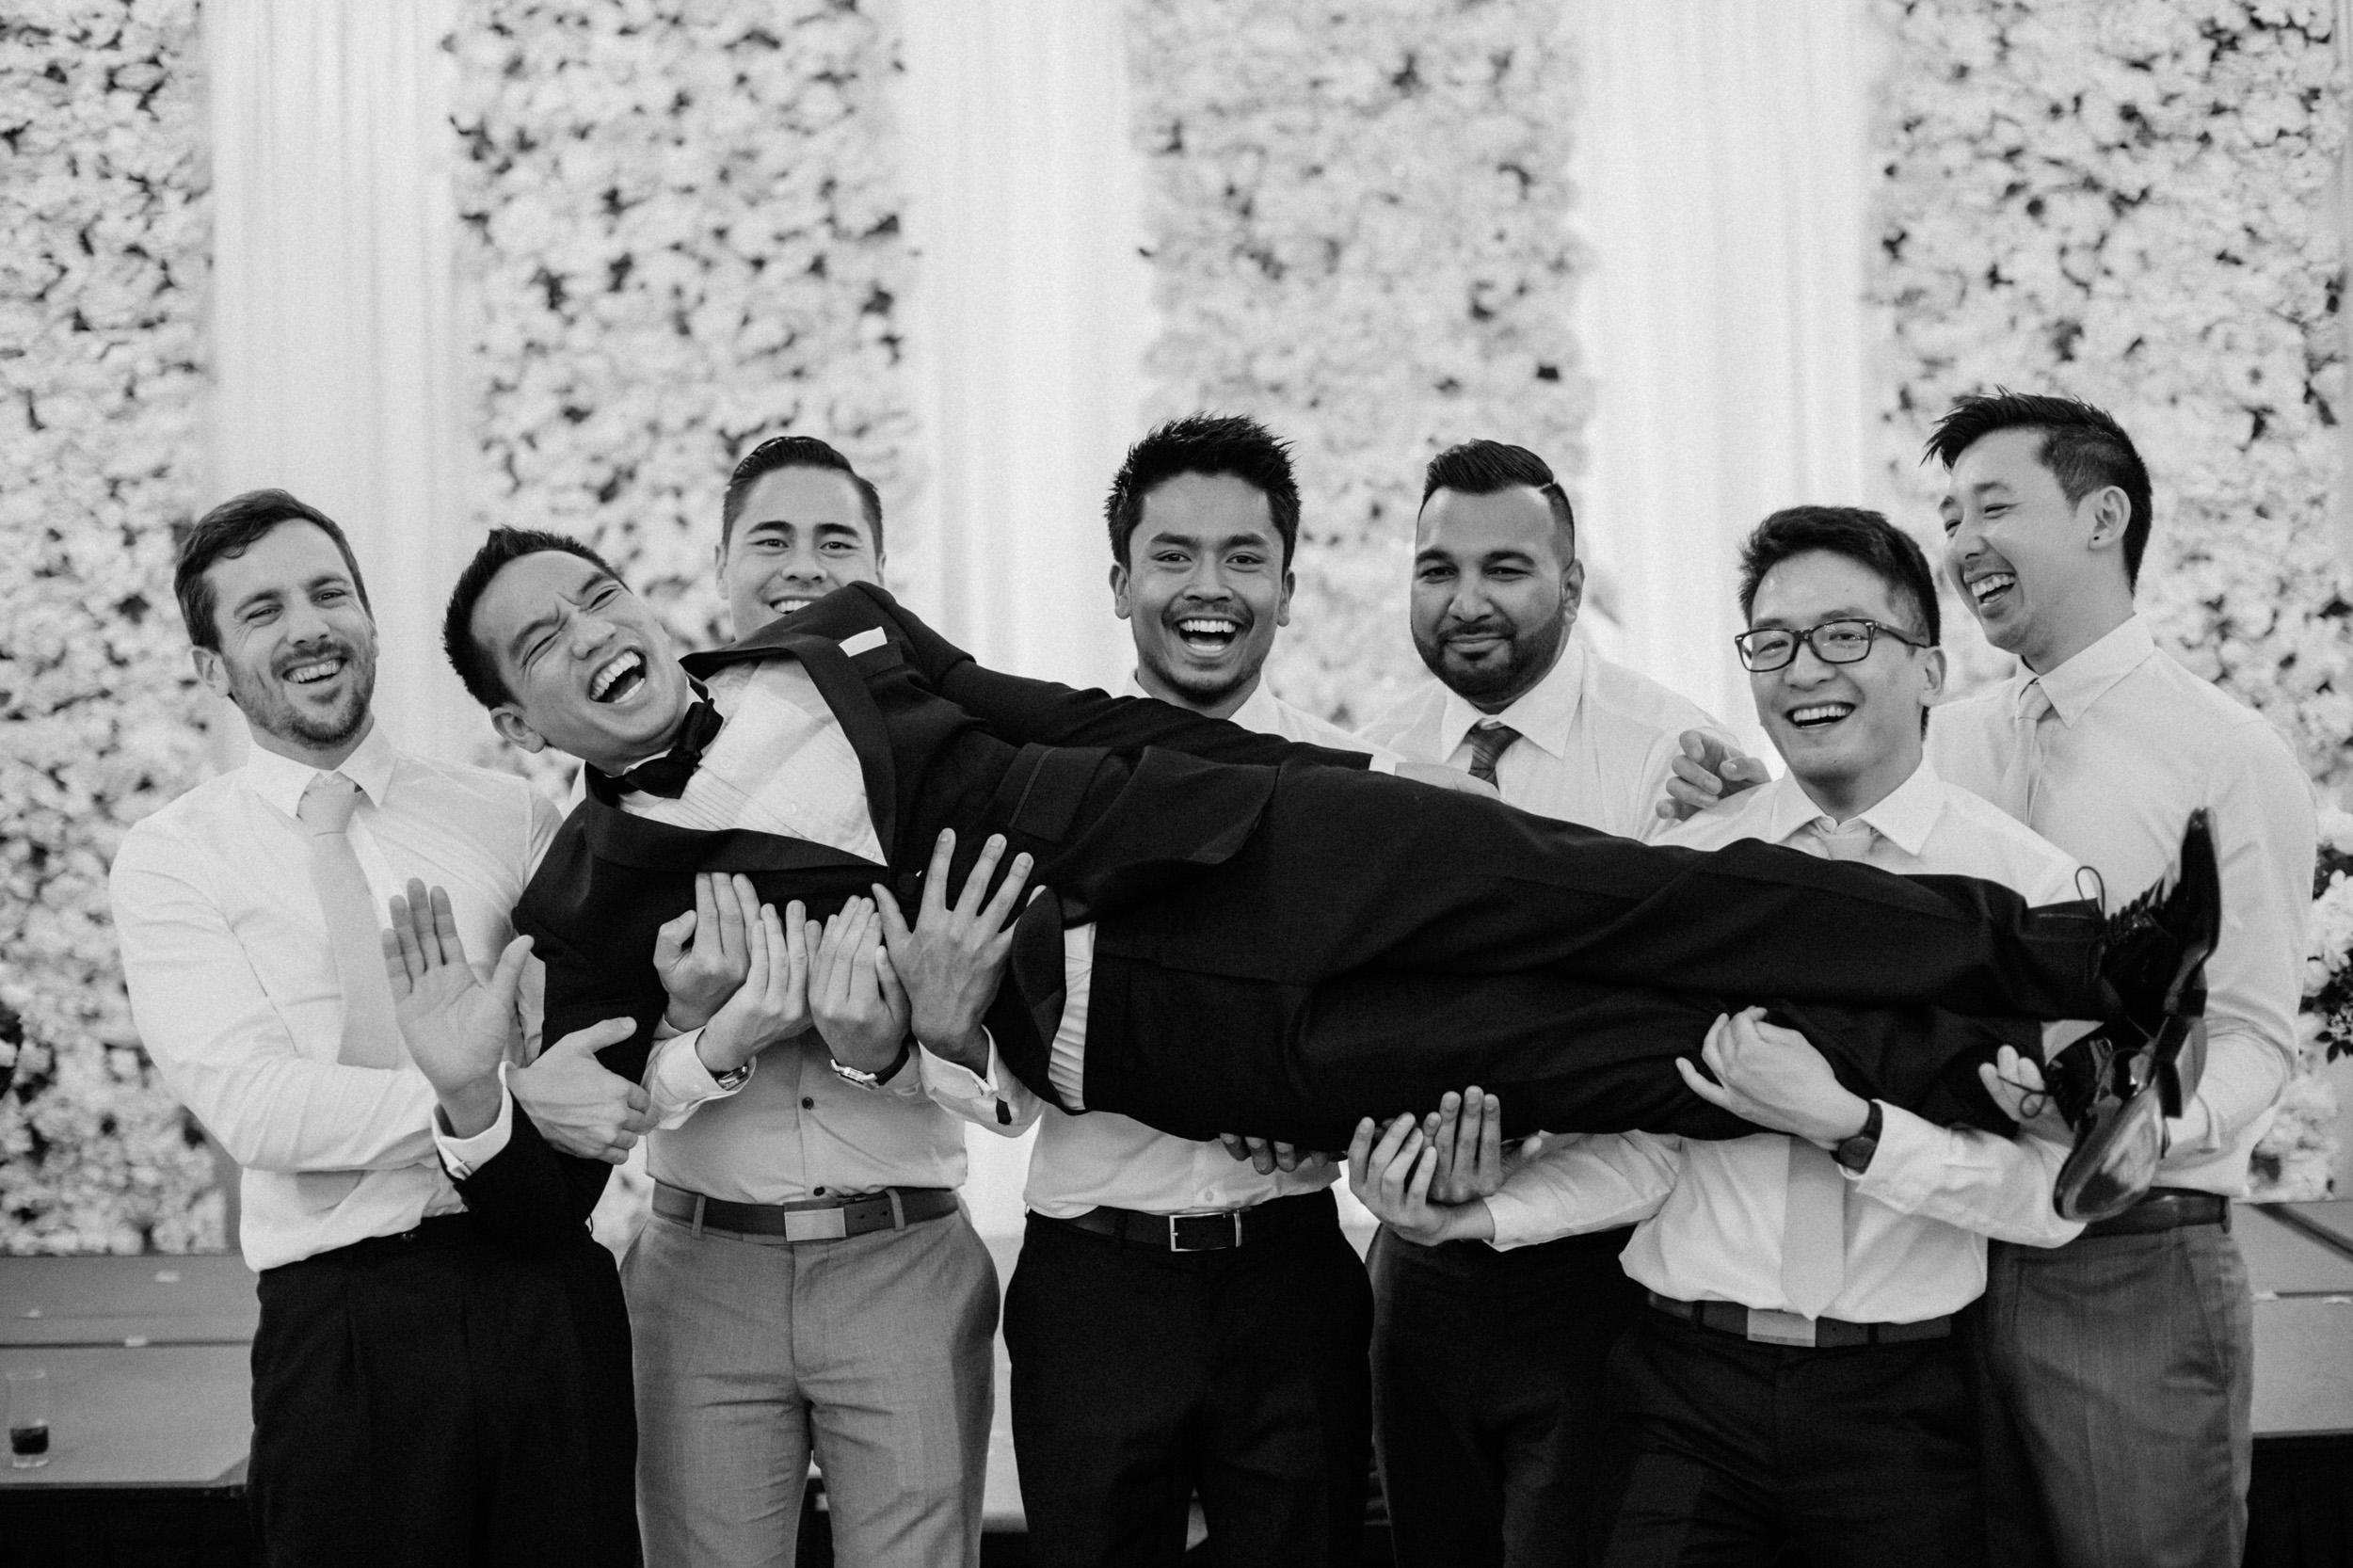 singapore-wedding-photographer-photography-wmt2017-107.jpg